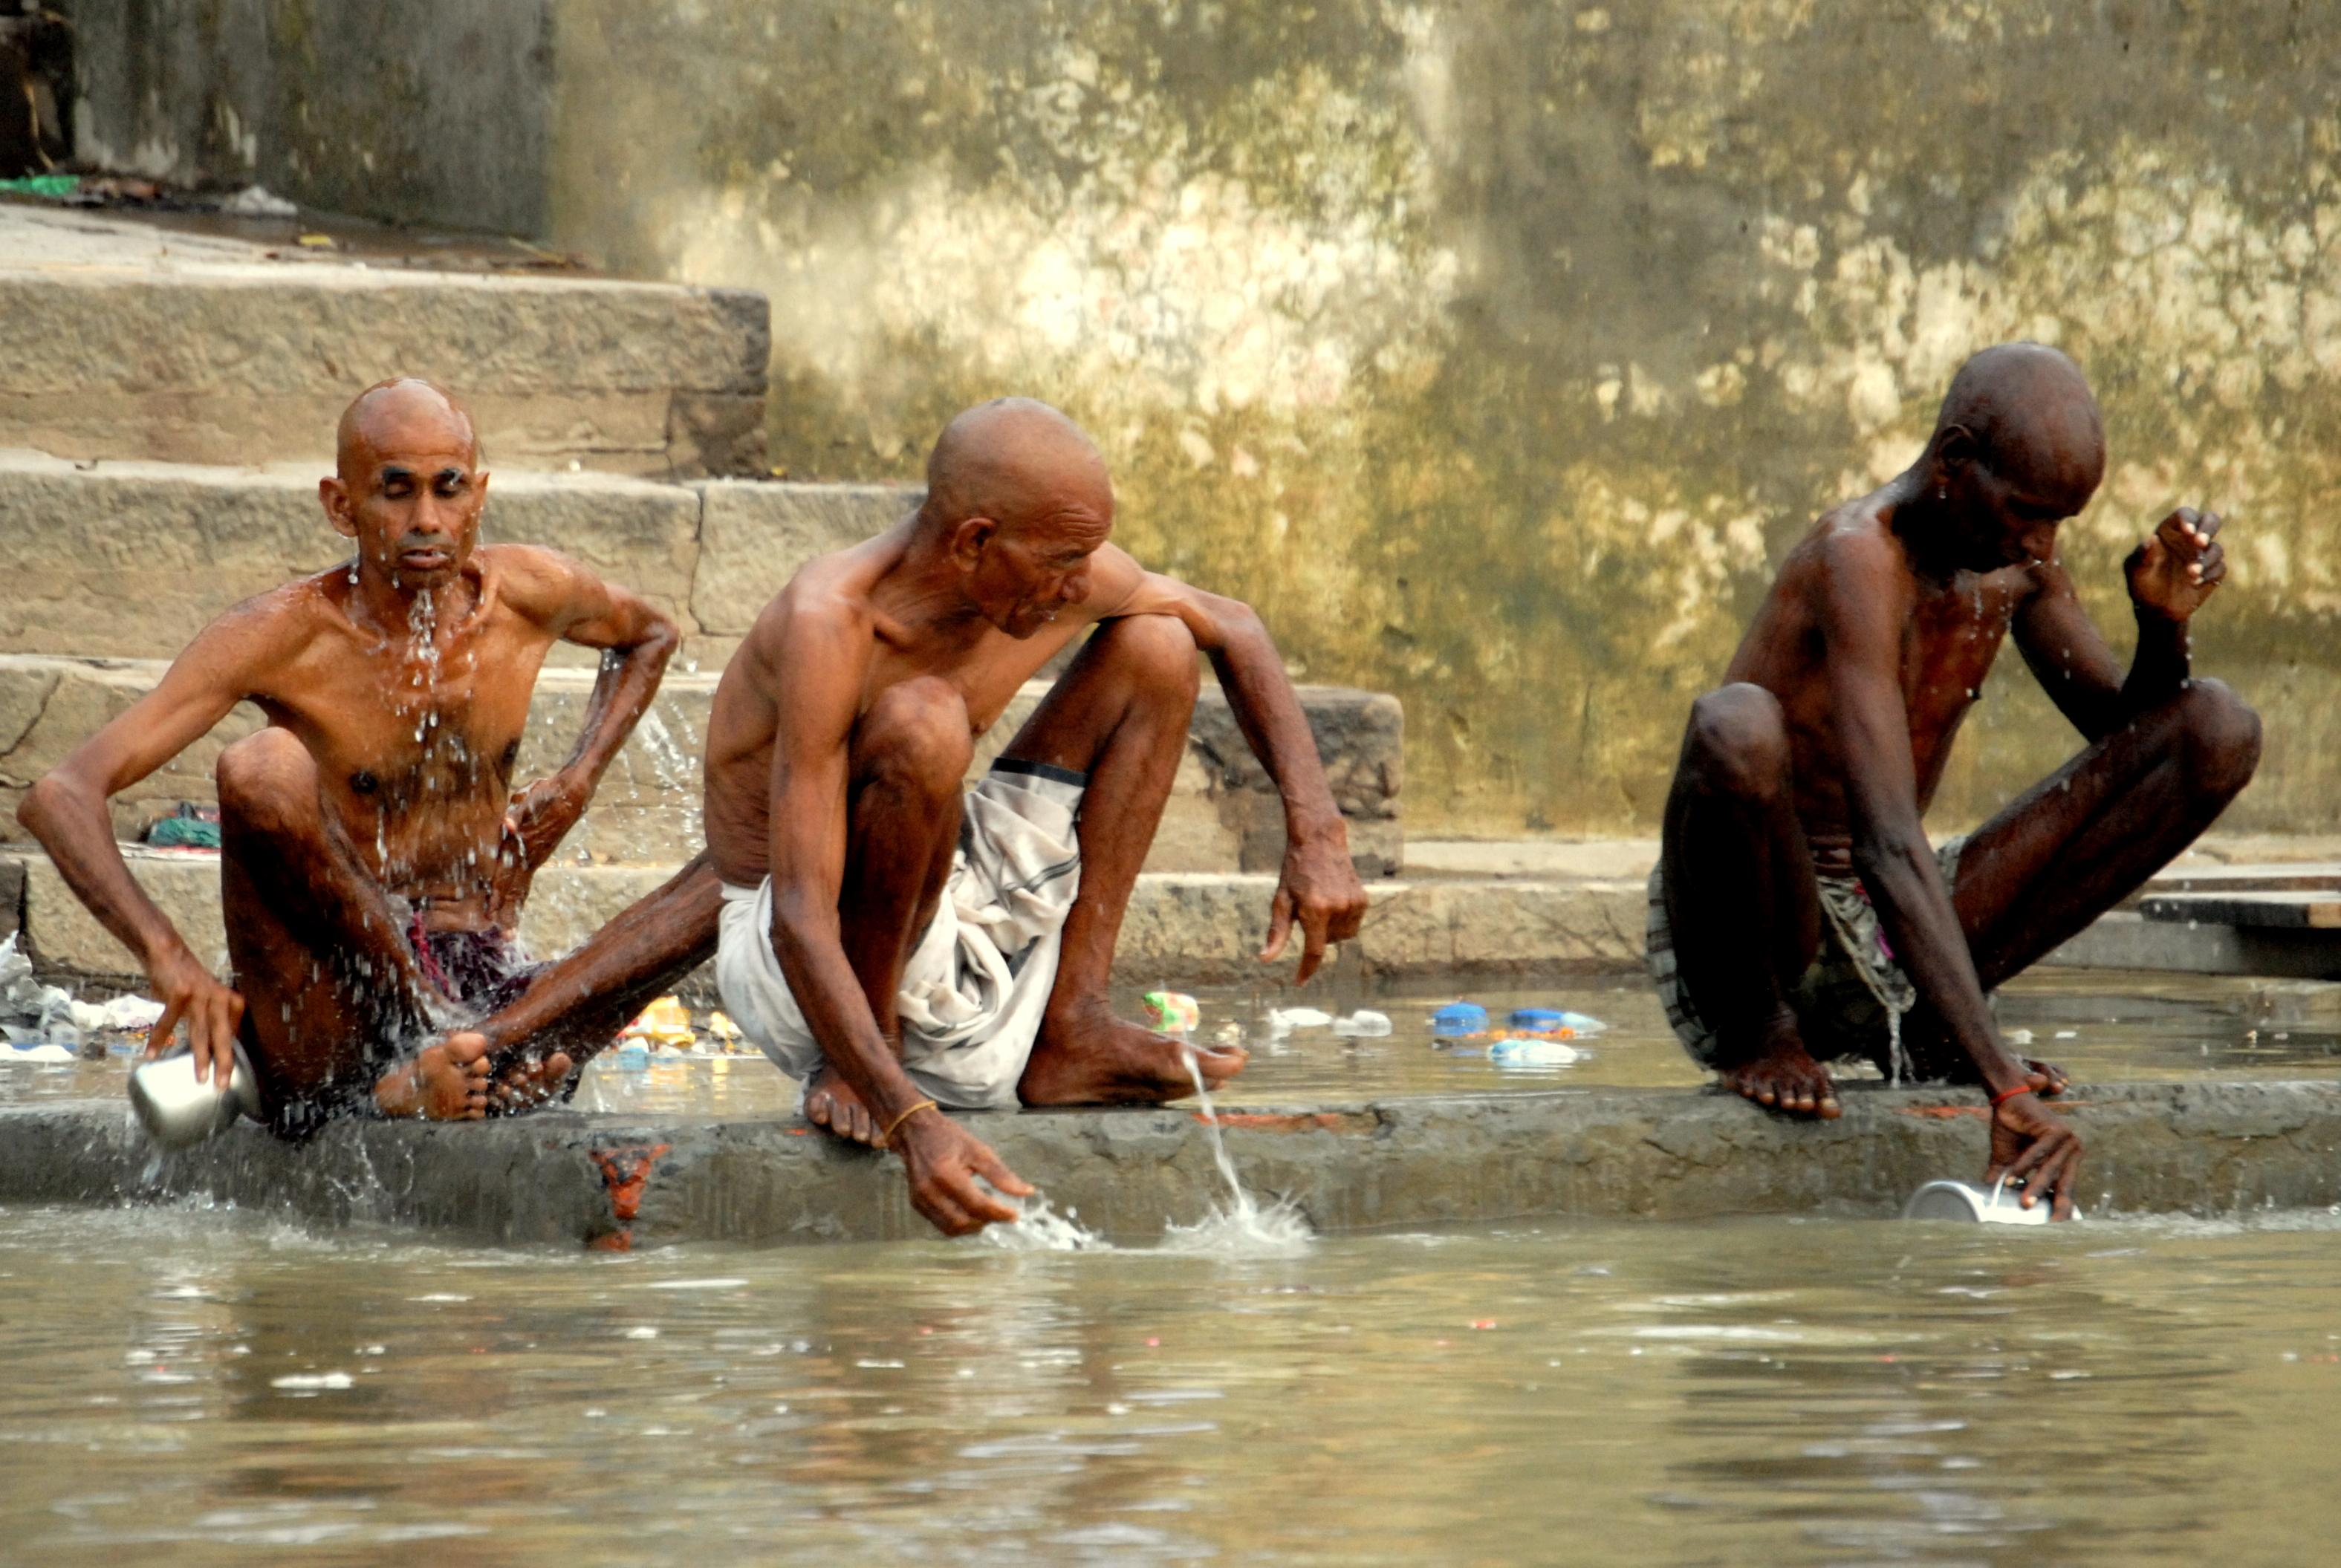 święte miasto Varanasi nad Gangesem w Indiach